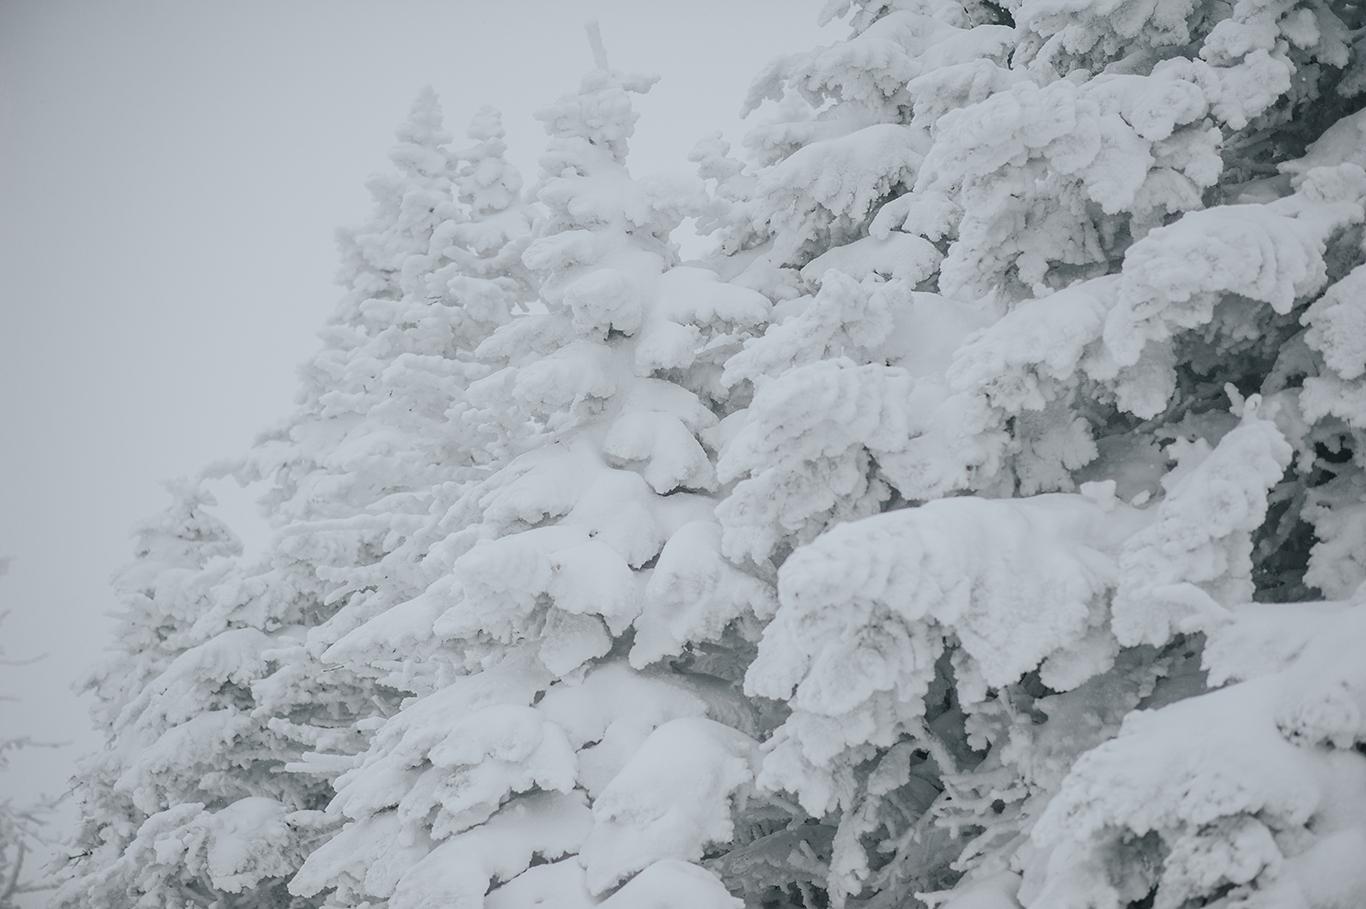 snow-covered-trees-vermont-winter-killington-peak-idena-photographer.jpg